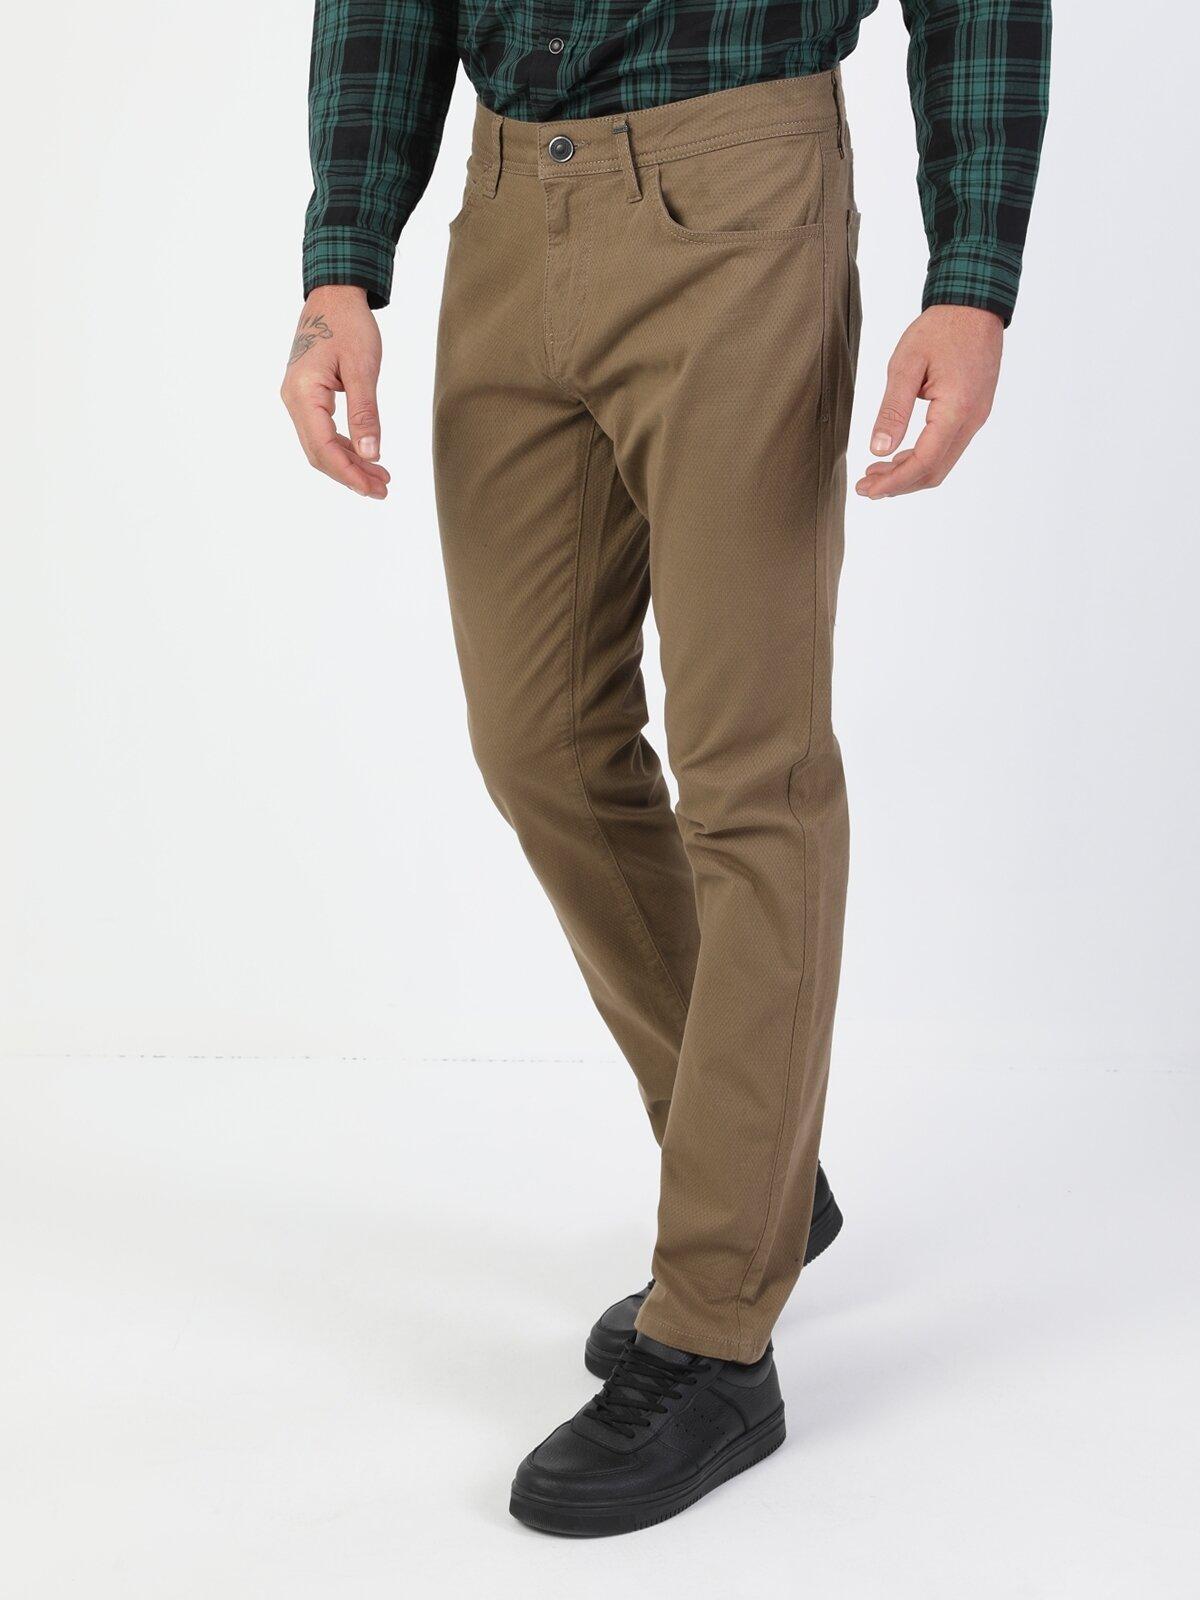 Düz Paça Normal Bel Sarı Chino Erkek Pantolon